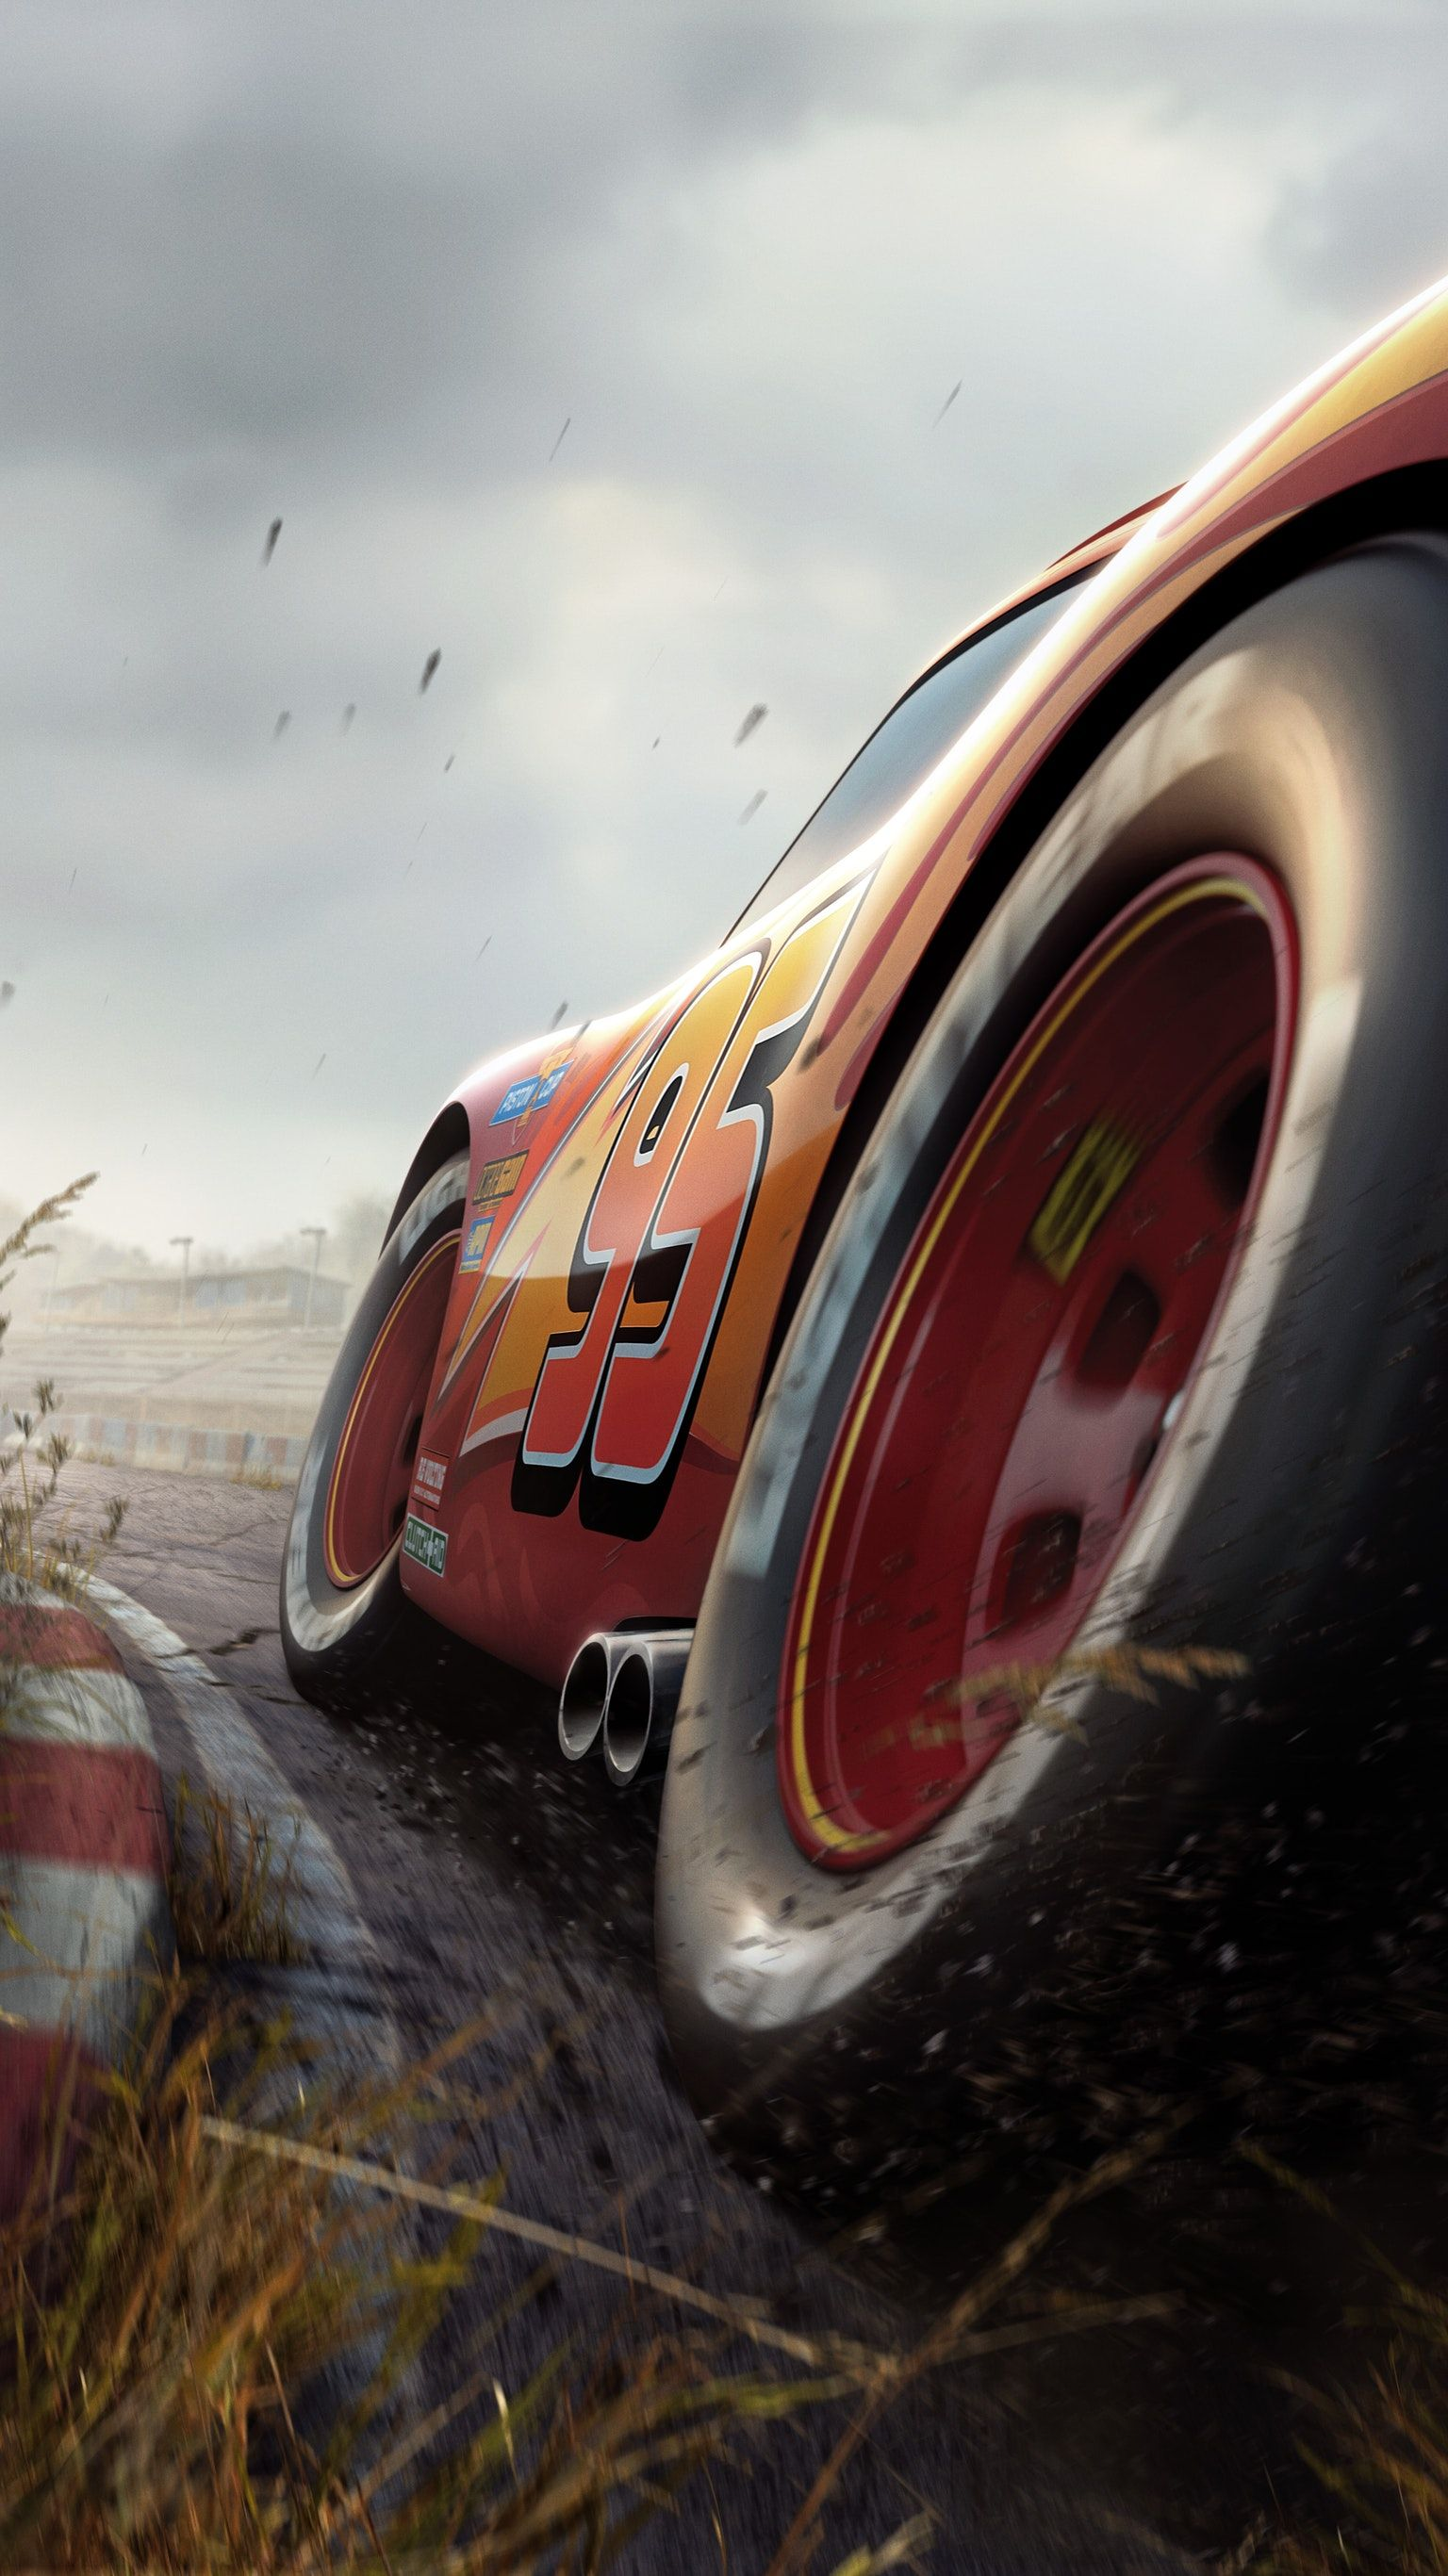 Cars 3 2017 Phone Wallpaper Moviemania Disney Cars Wallpaper Cars Movie Cars 3 Poster